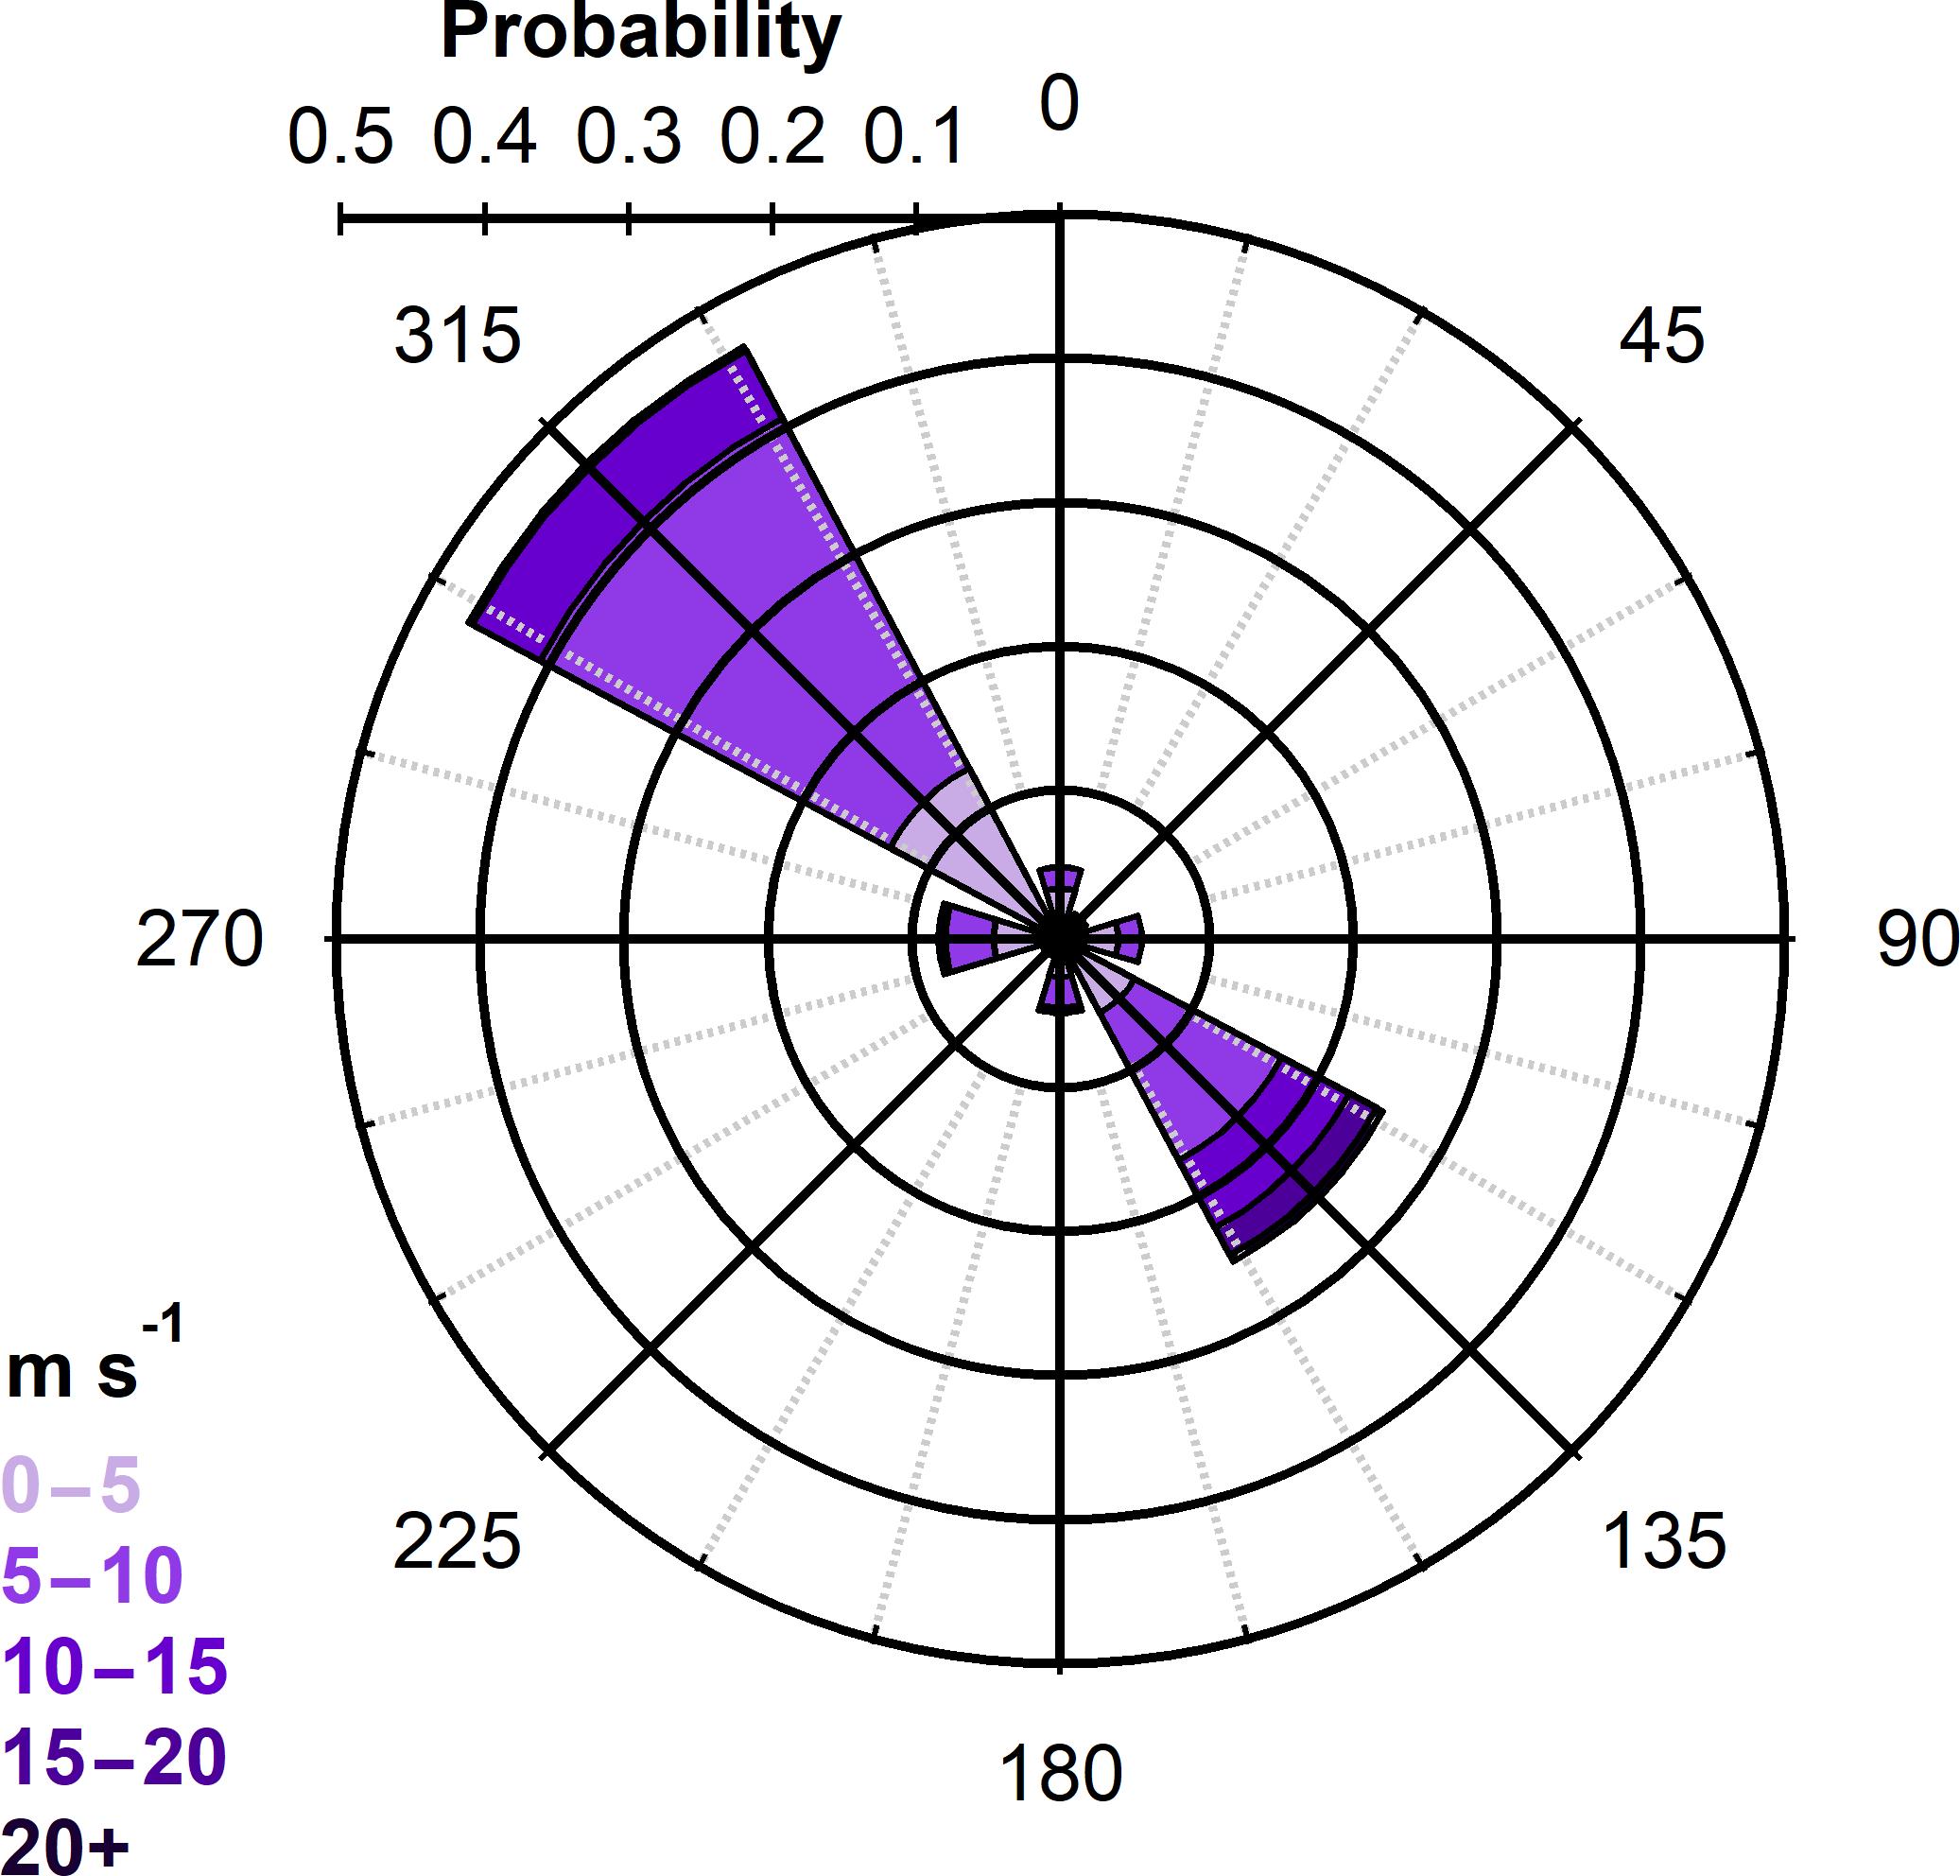 ACP - Using freezing spectra characteristics to identify ice